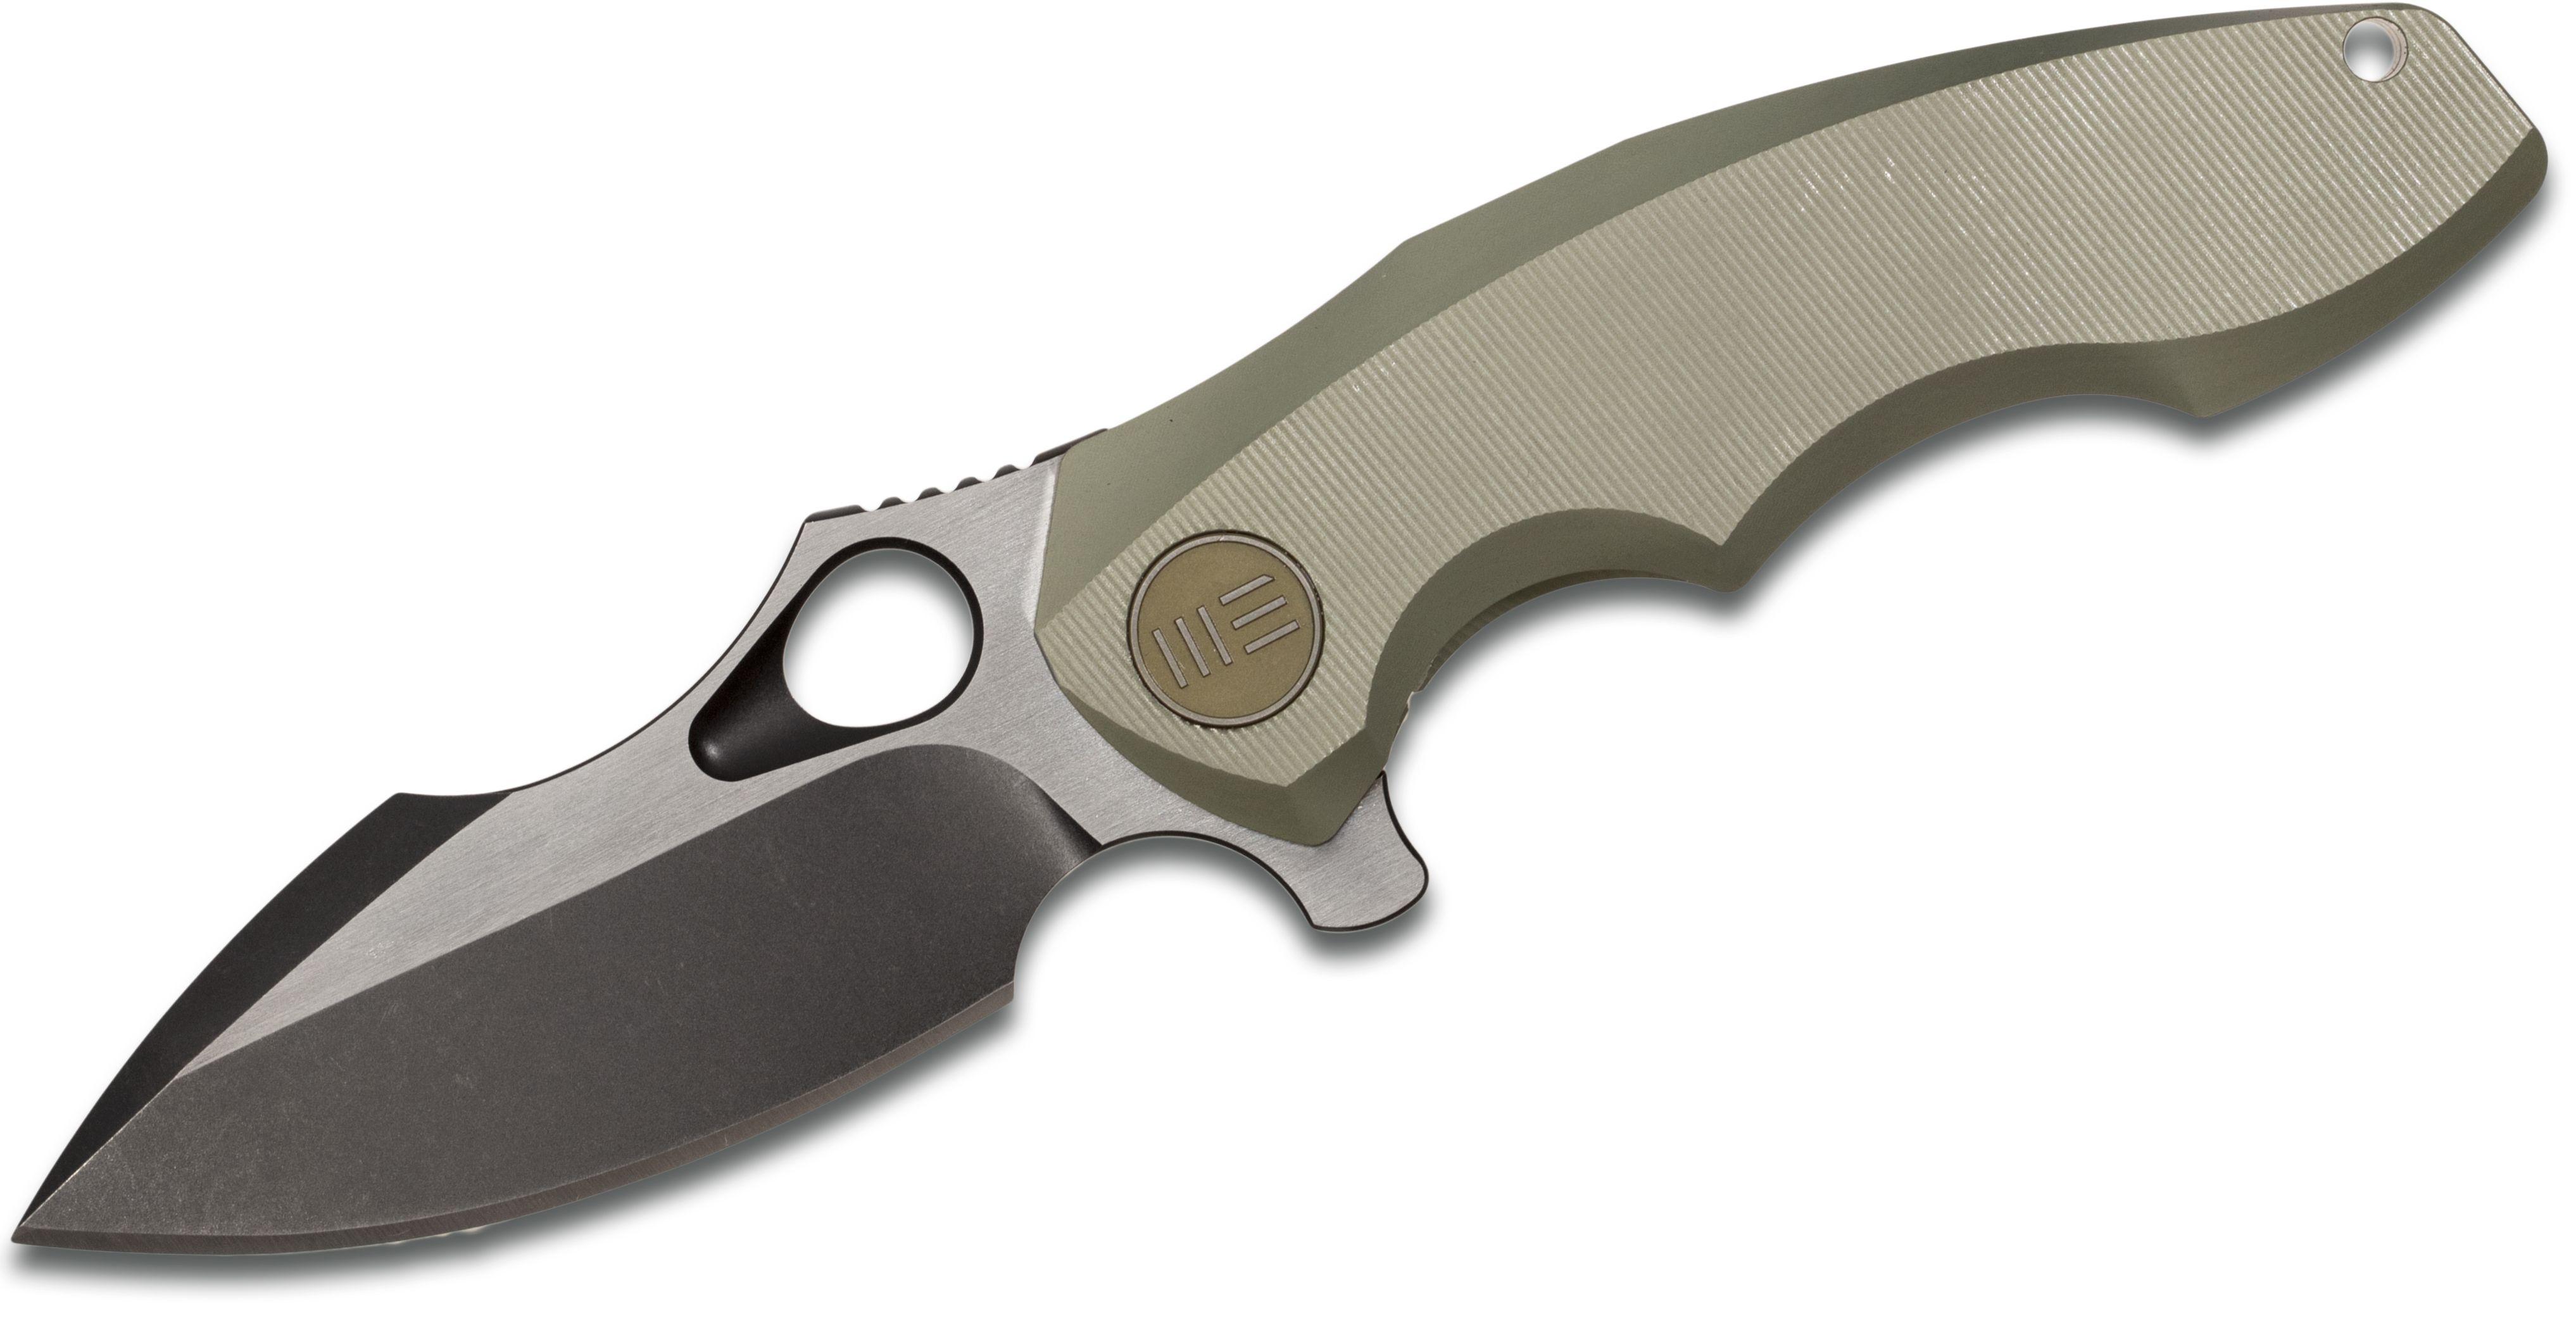 We Knife Company 605D Flipper 3 inch S35VN Black Two-Tone Blade, Green Titanium Handles